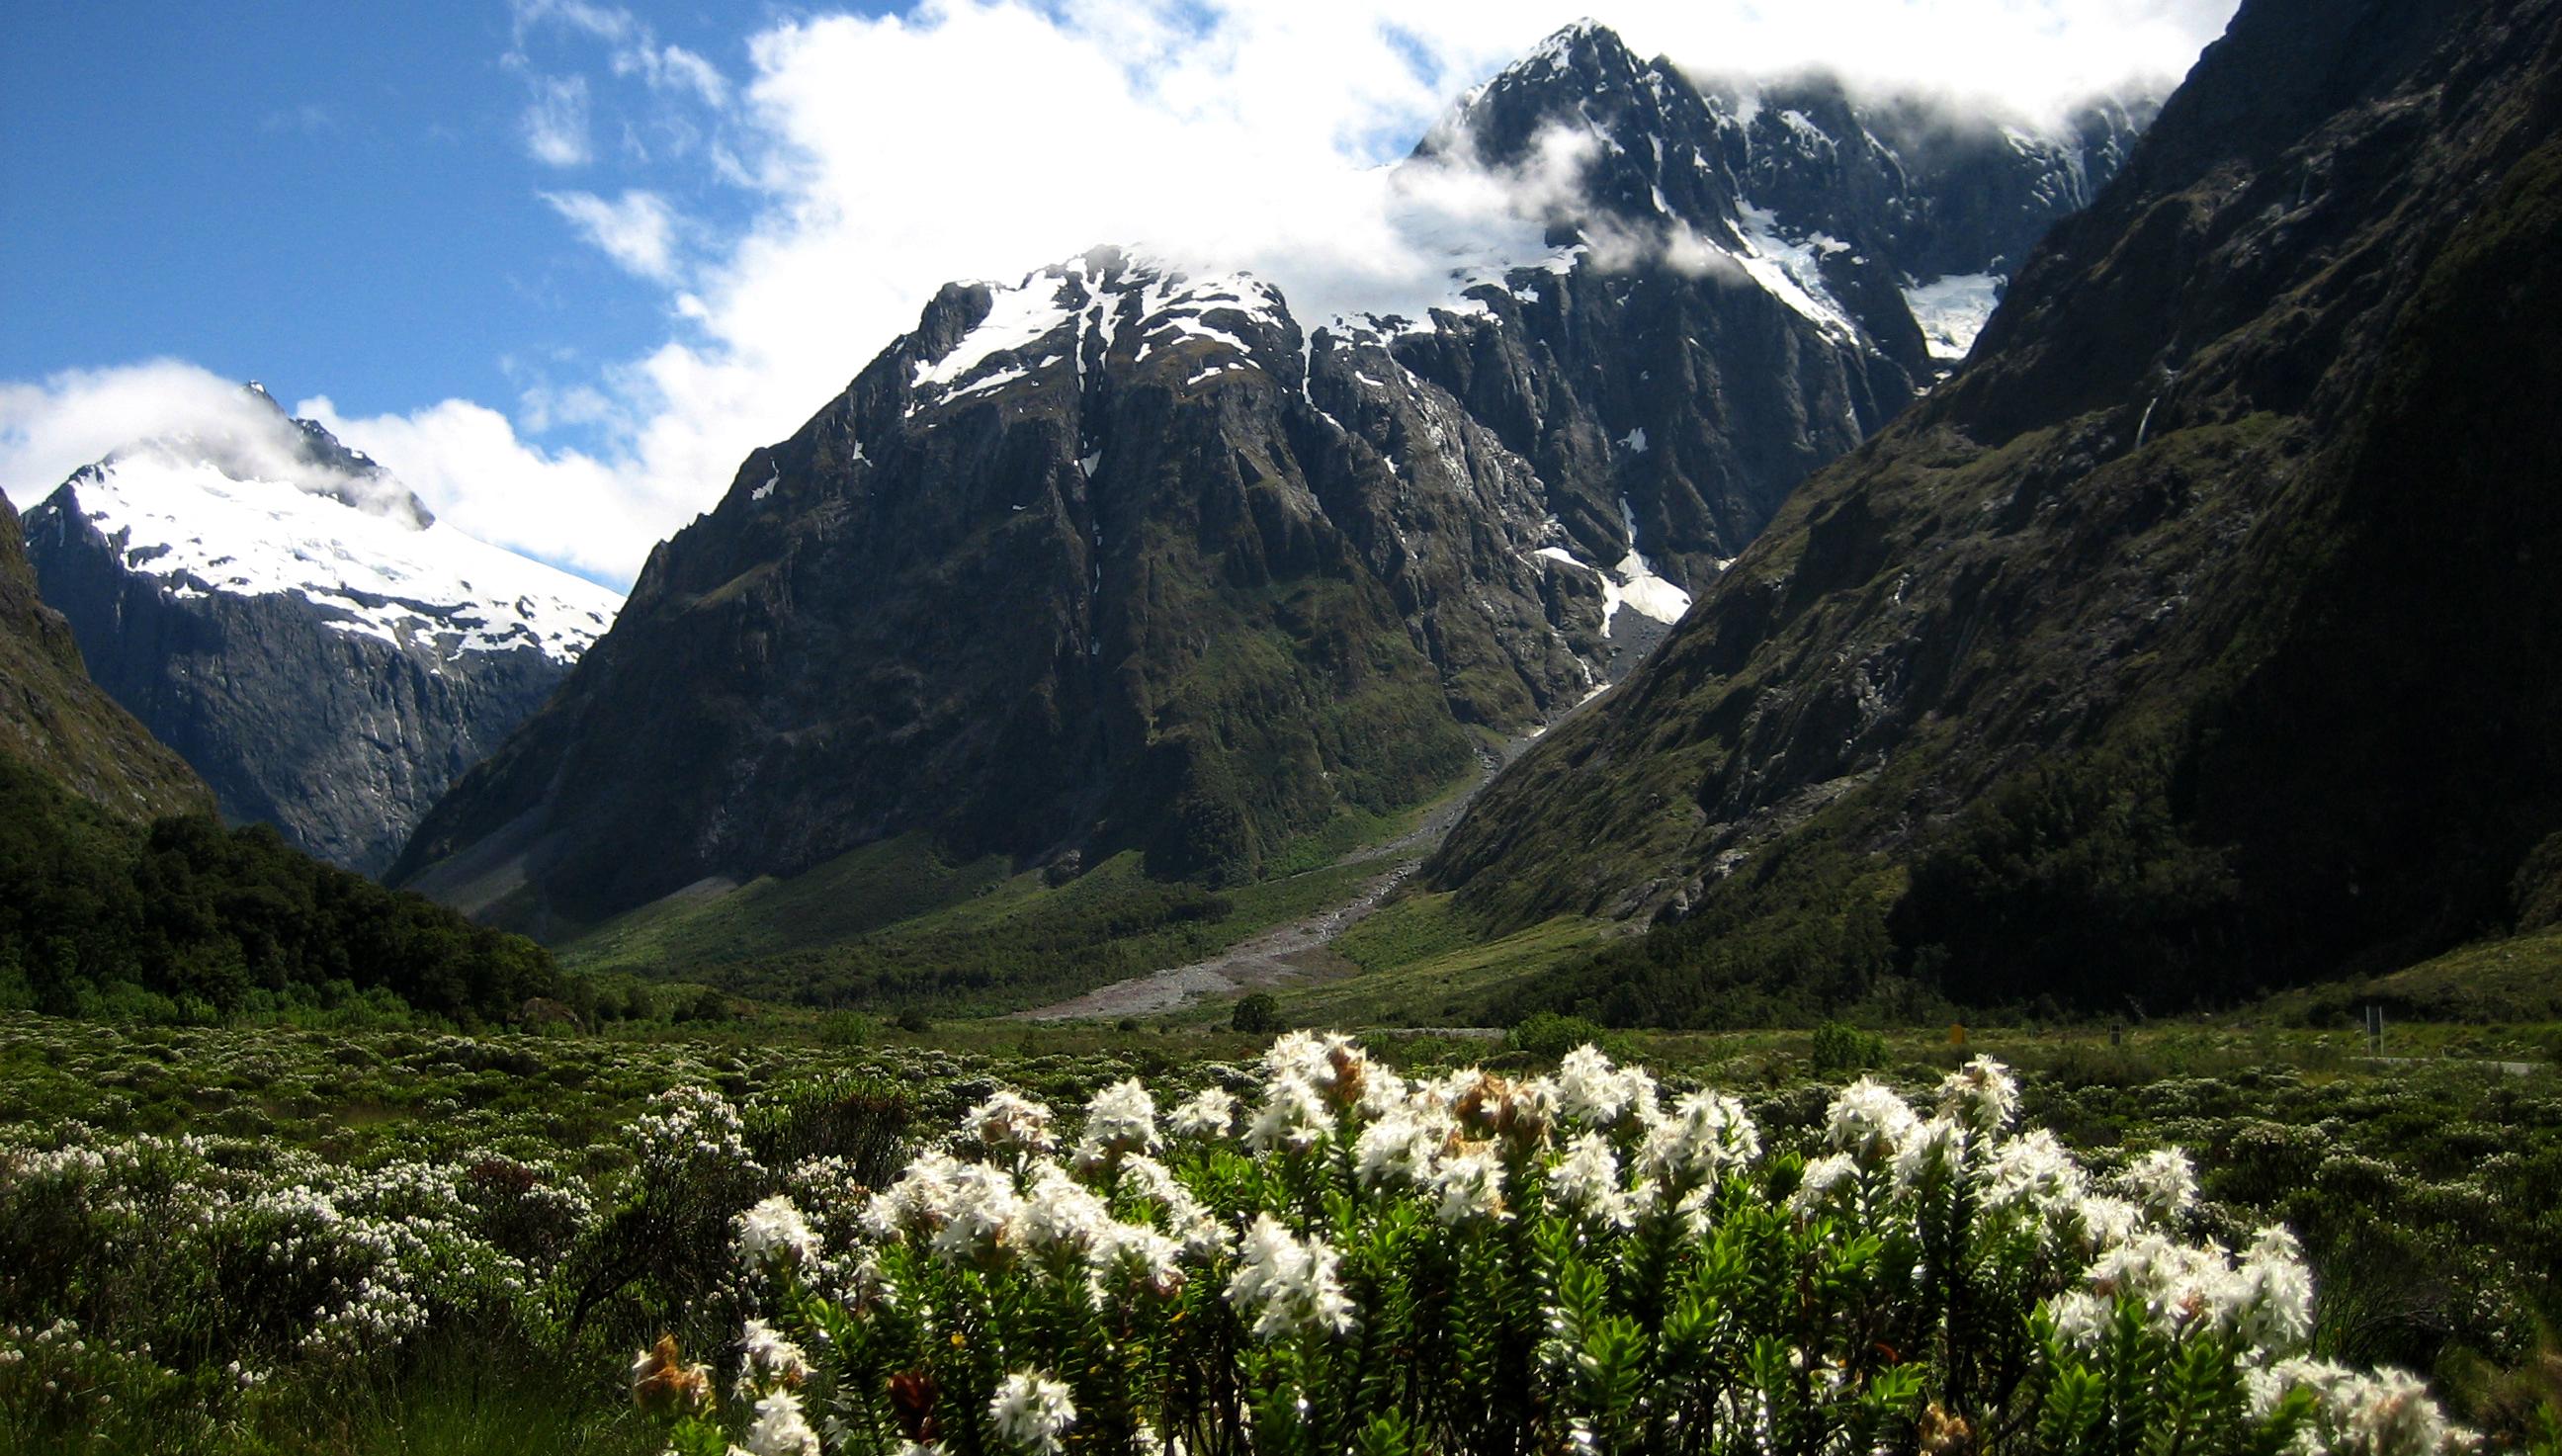 Fiordland Factors Fiordland National Park